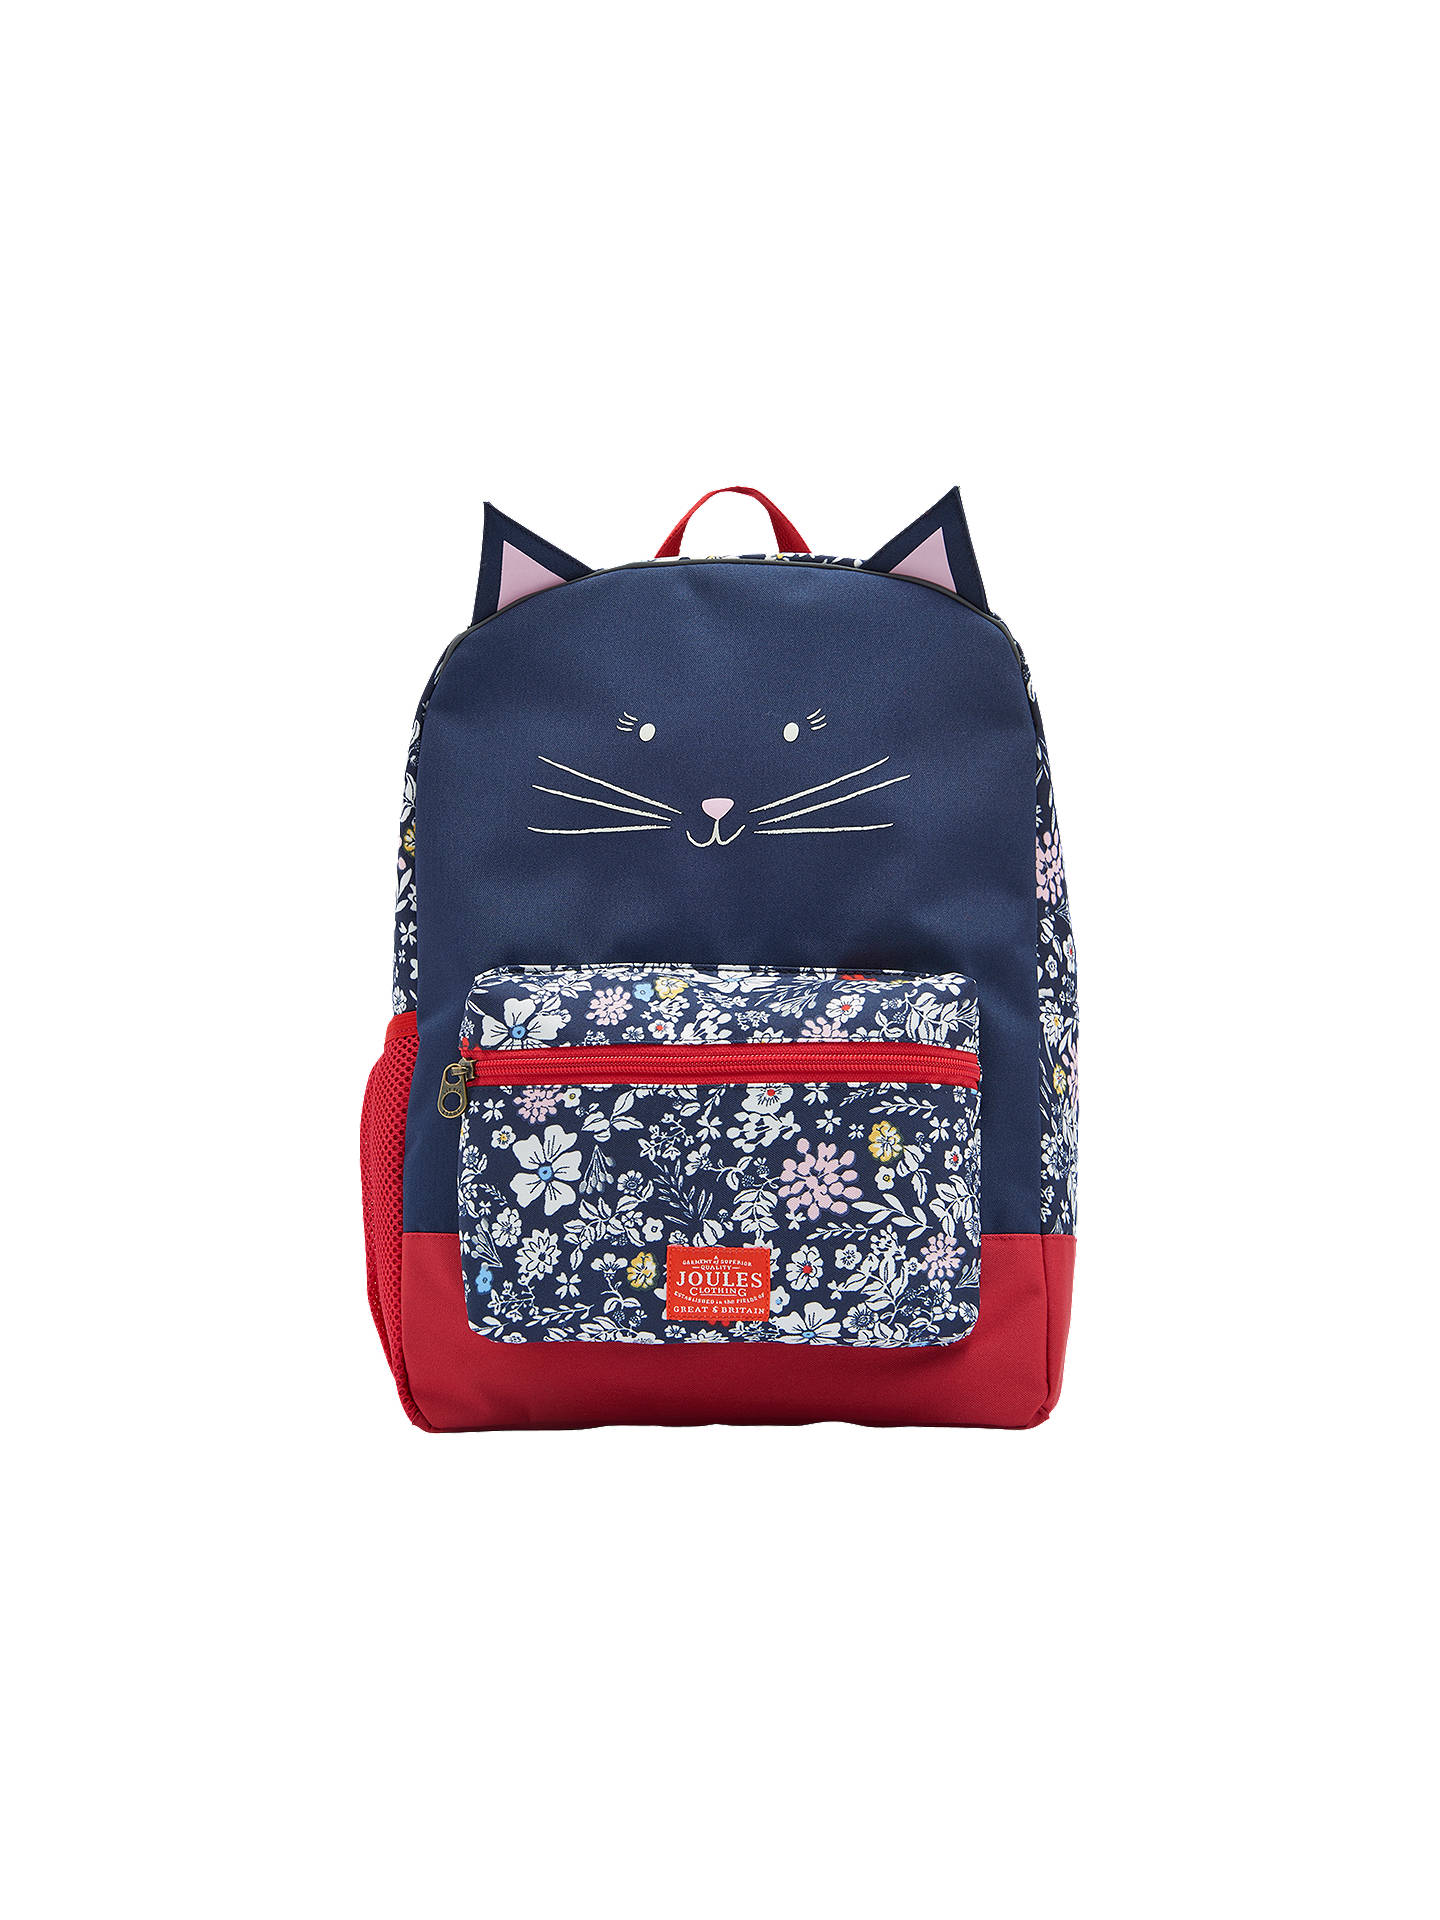 fa3db69354 Buy Joules Meow Children s Rucksack